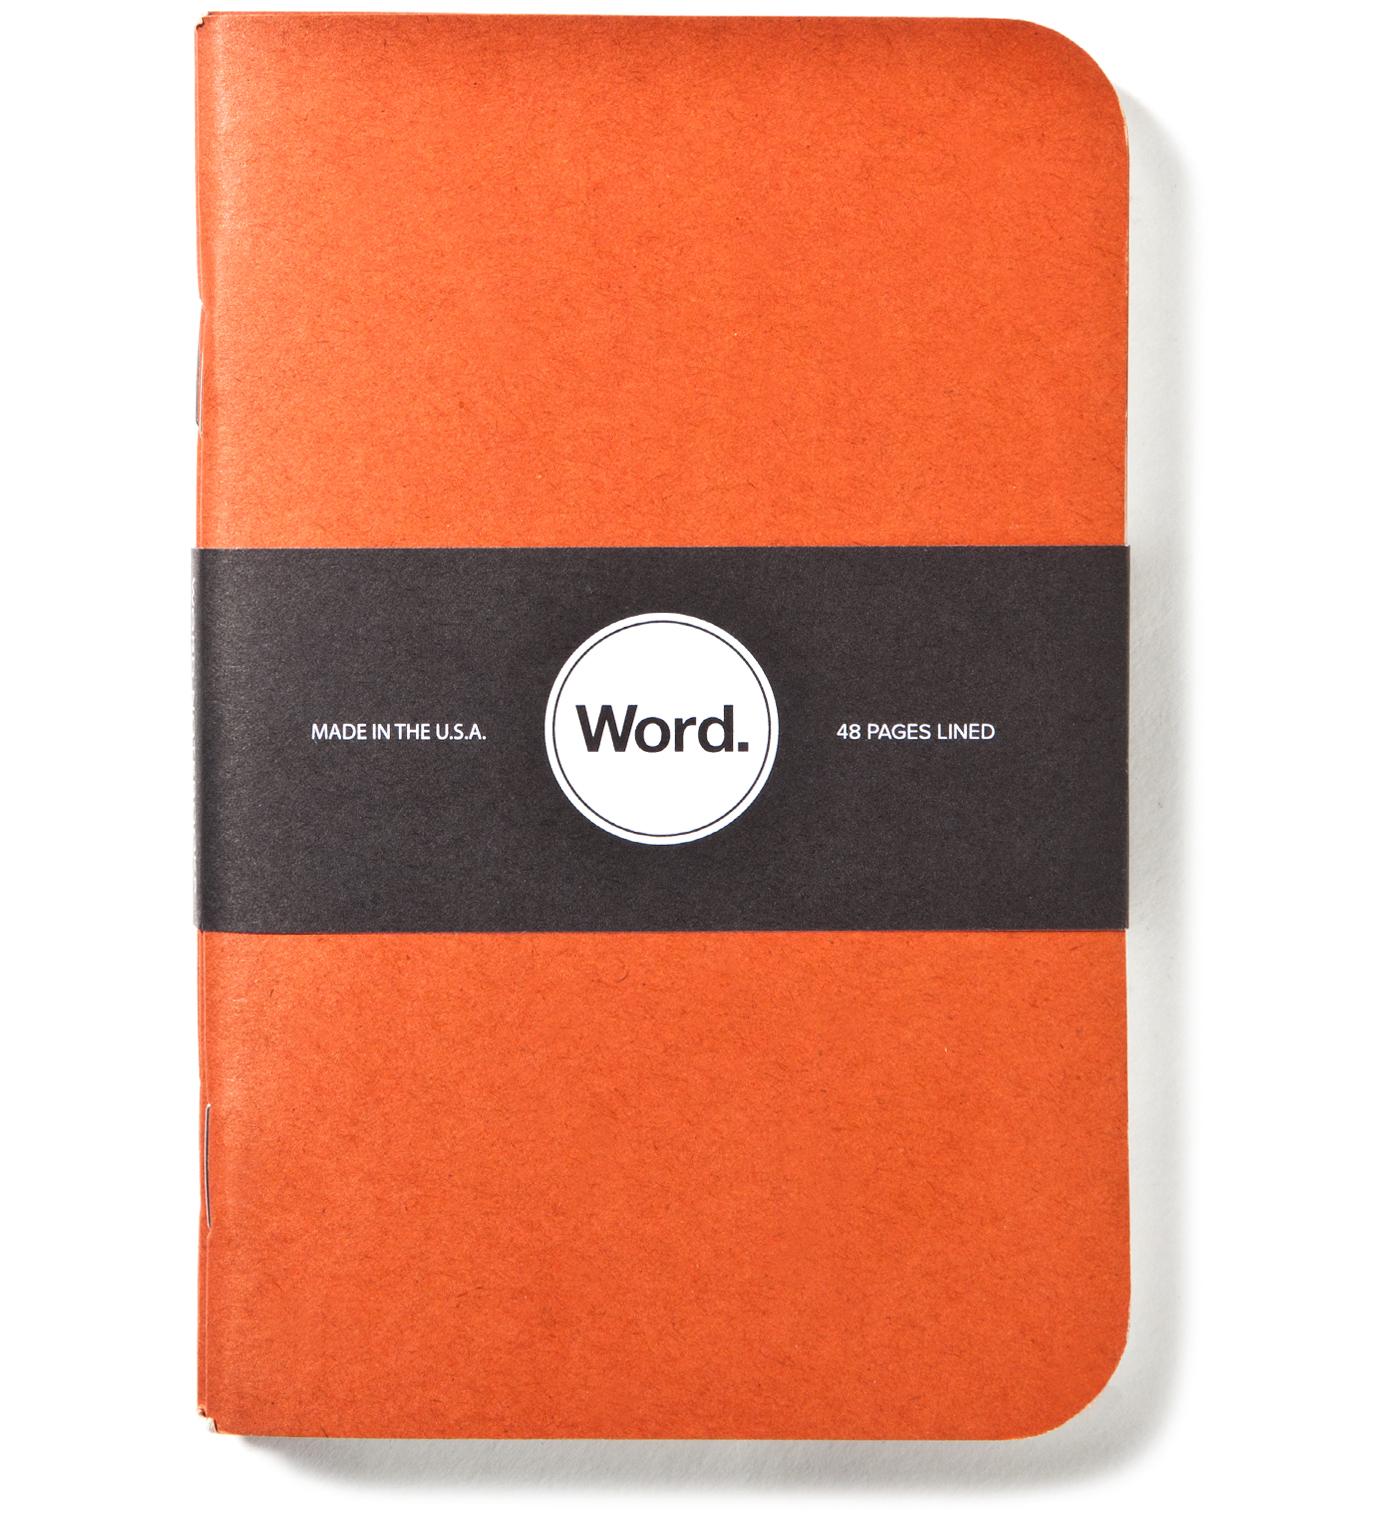 Word. Orange Camo 3 Pack Notebook